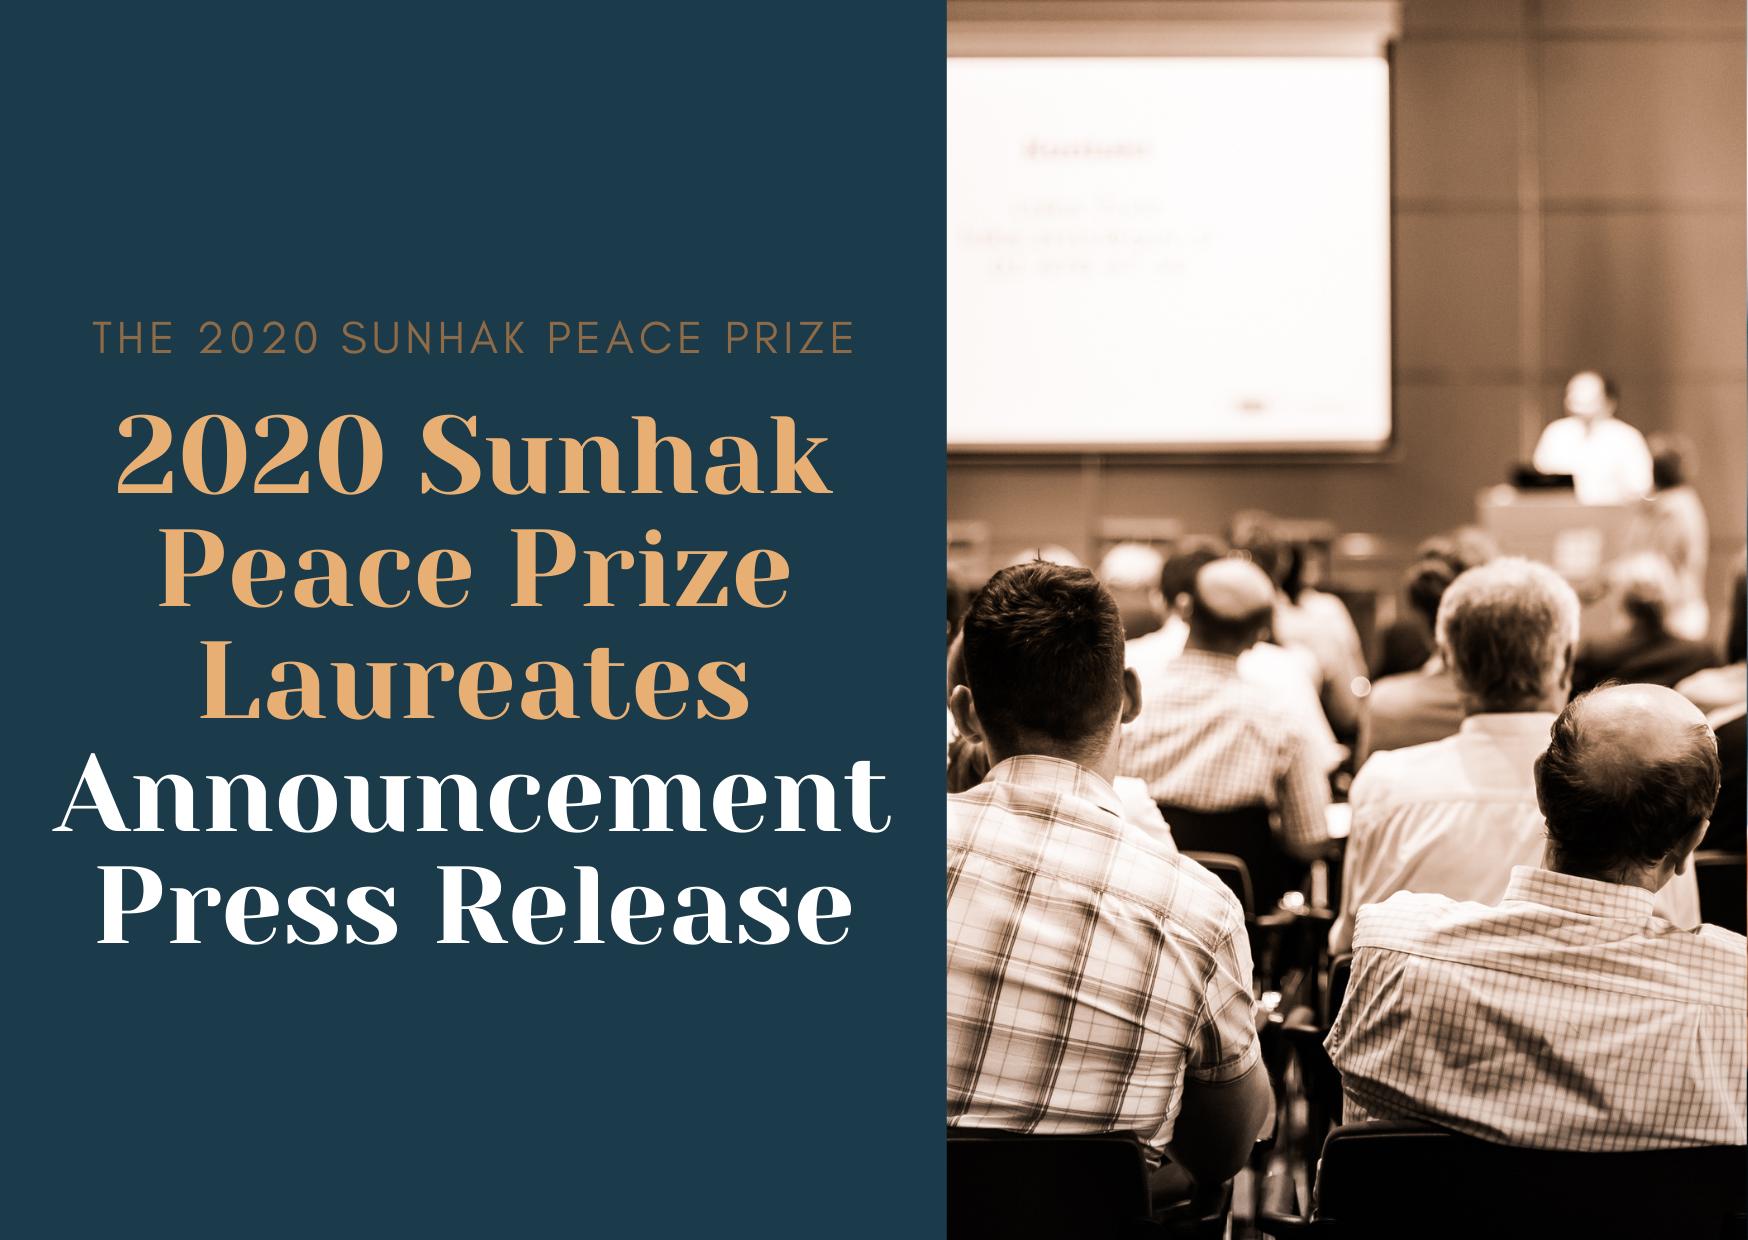 2020 Sunhak Peace Prize Laureates Announcement Press Release 썸네일